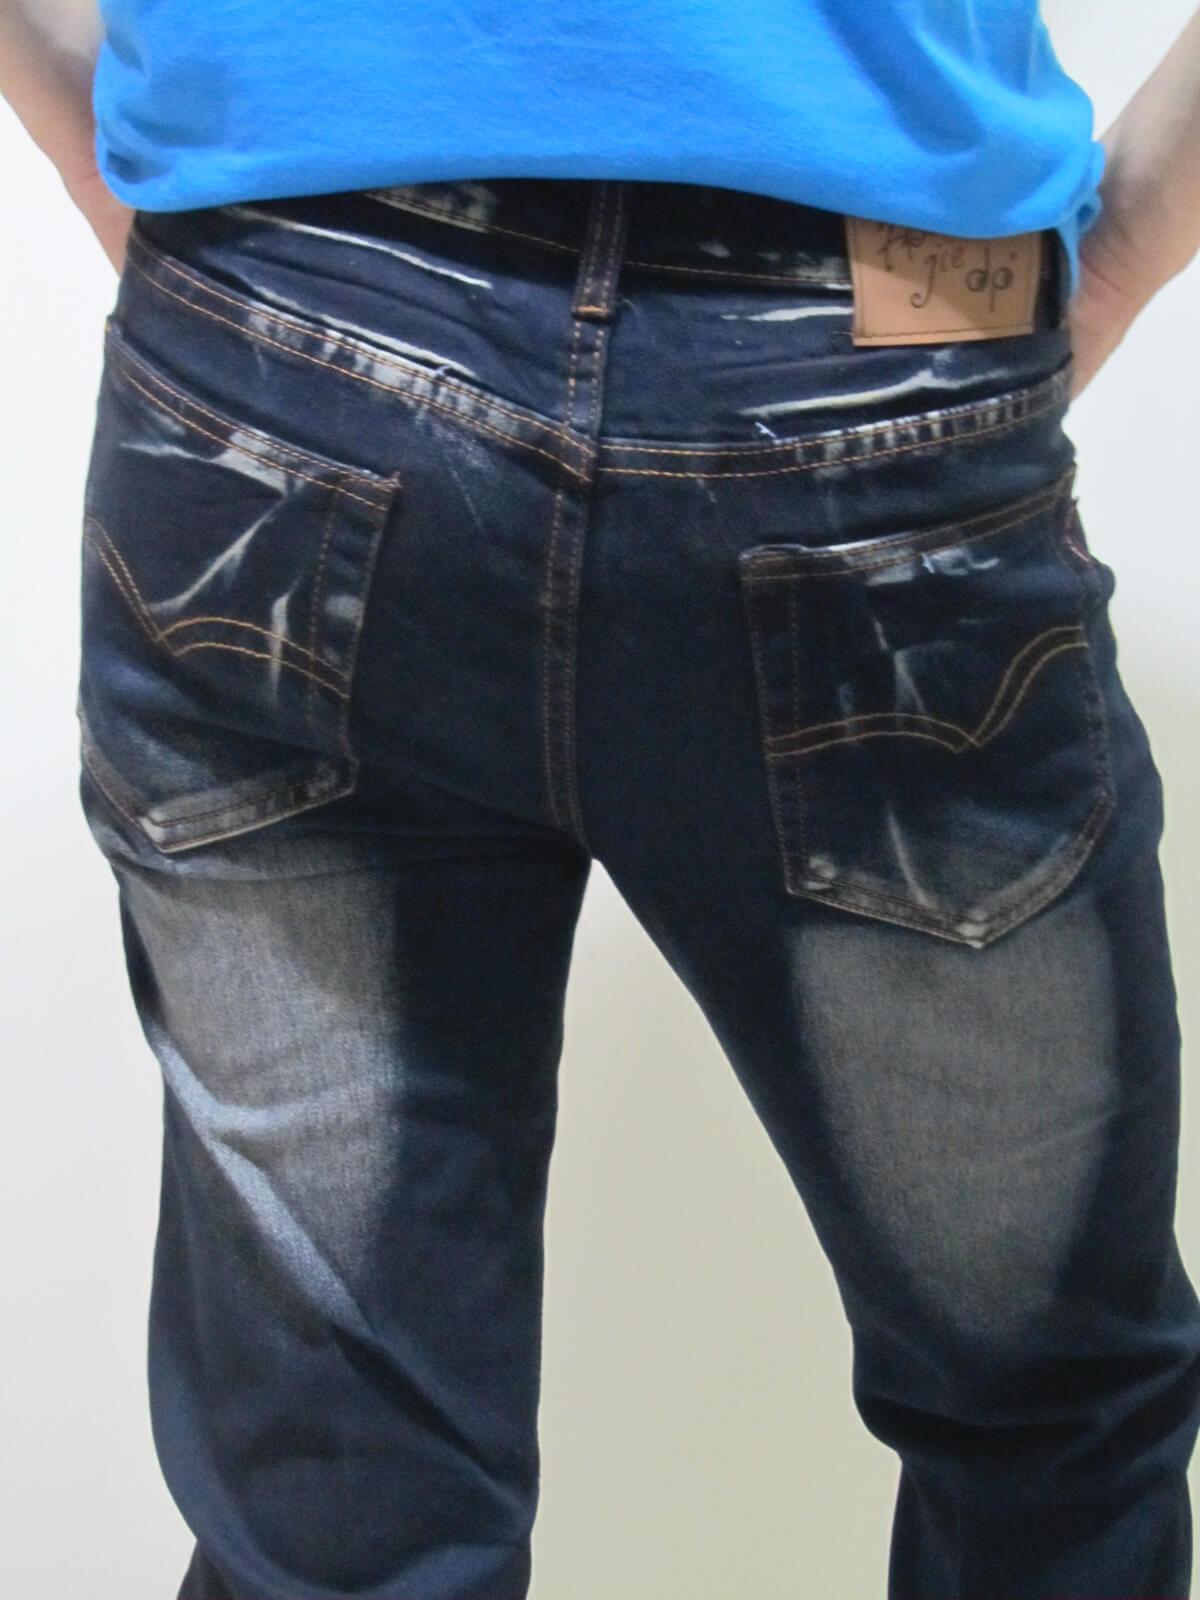 sun-e貓爪刷白牛仔褲、伸縮直筒修身牛仔長褲、顯瘦丹寧長褲、彈力牛仔長褲(307-7013-21)黑 腰圍:M L XL 2L 3L 4L(28~39英吋) 2